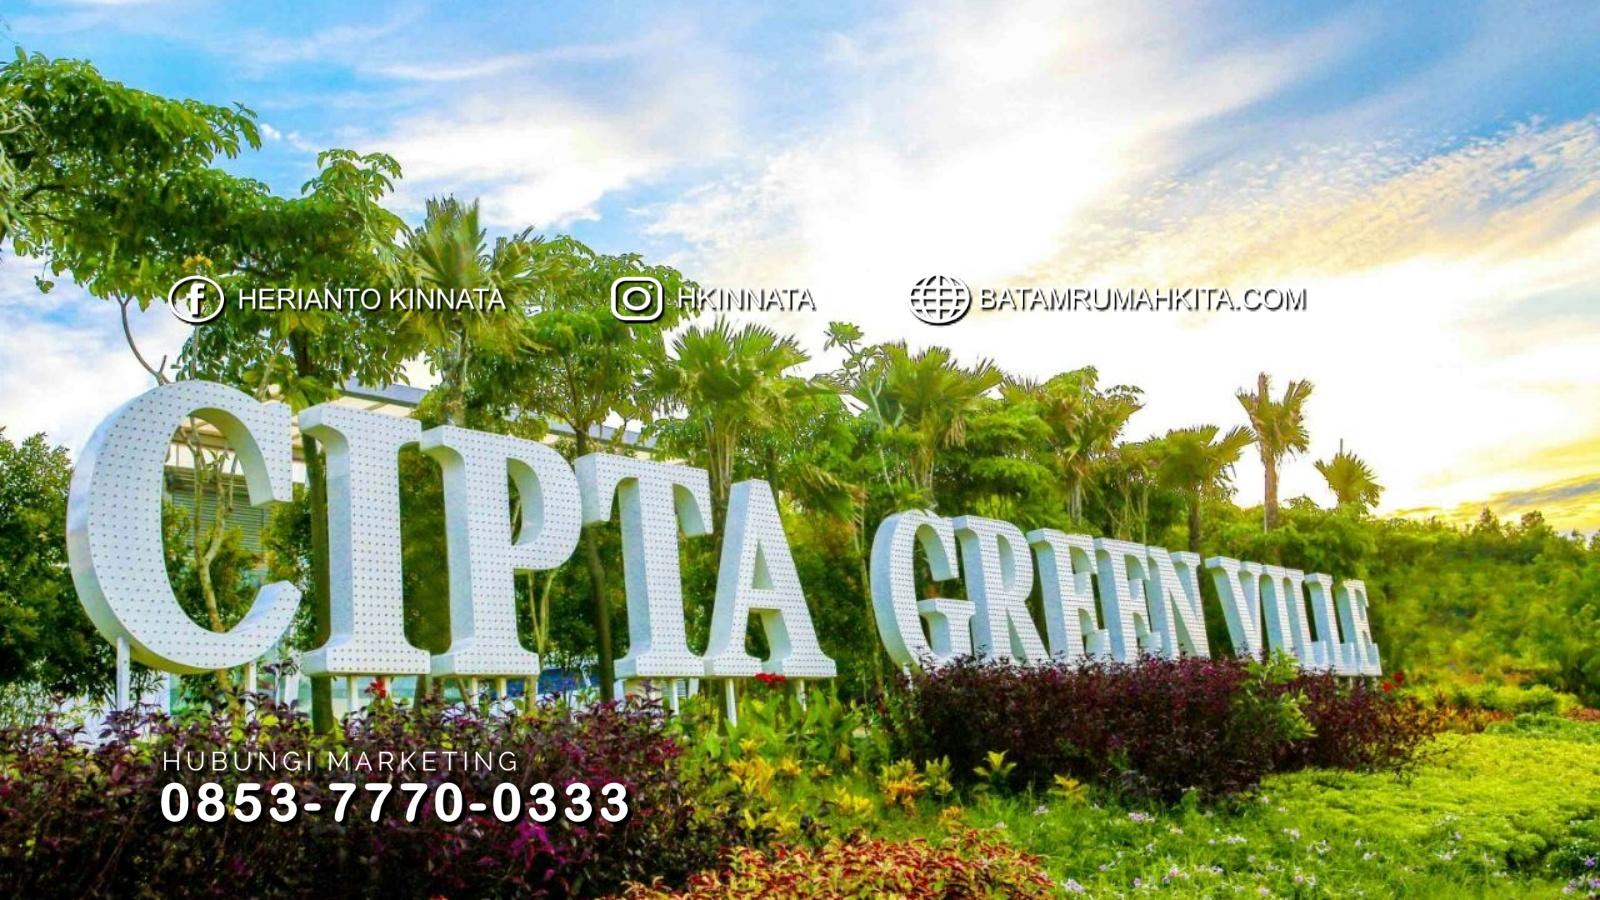 Cipta Green Ville